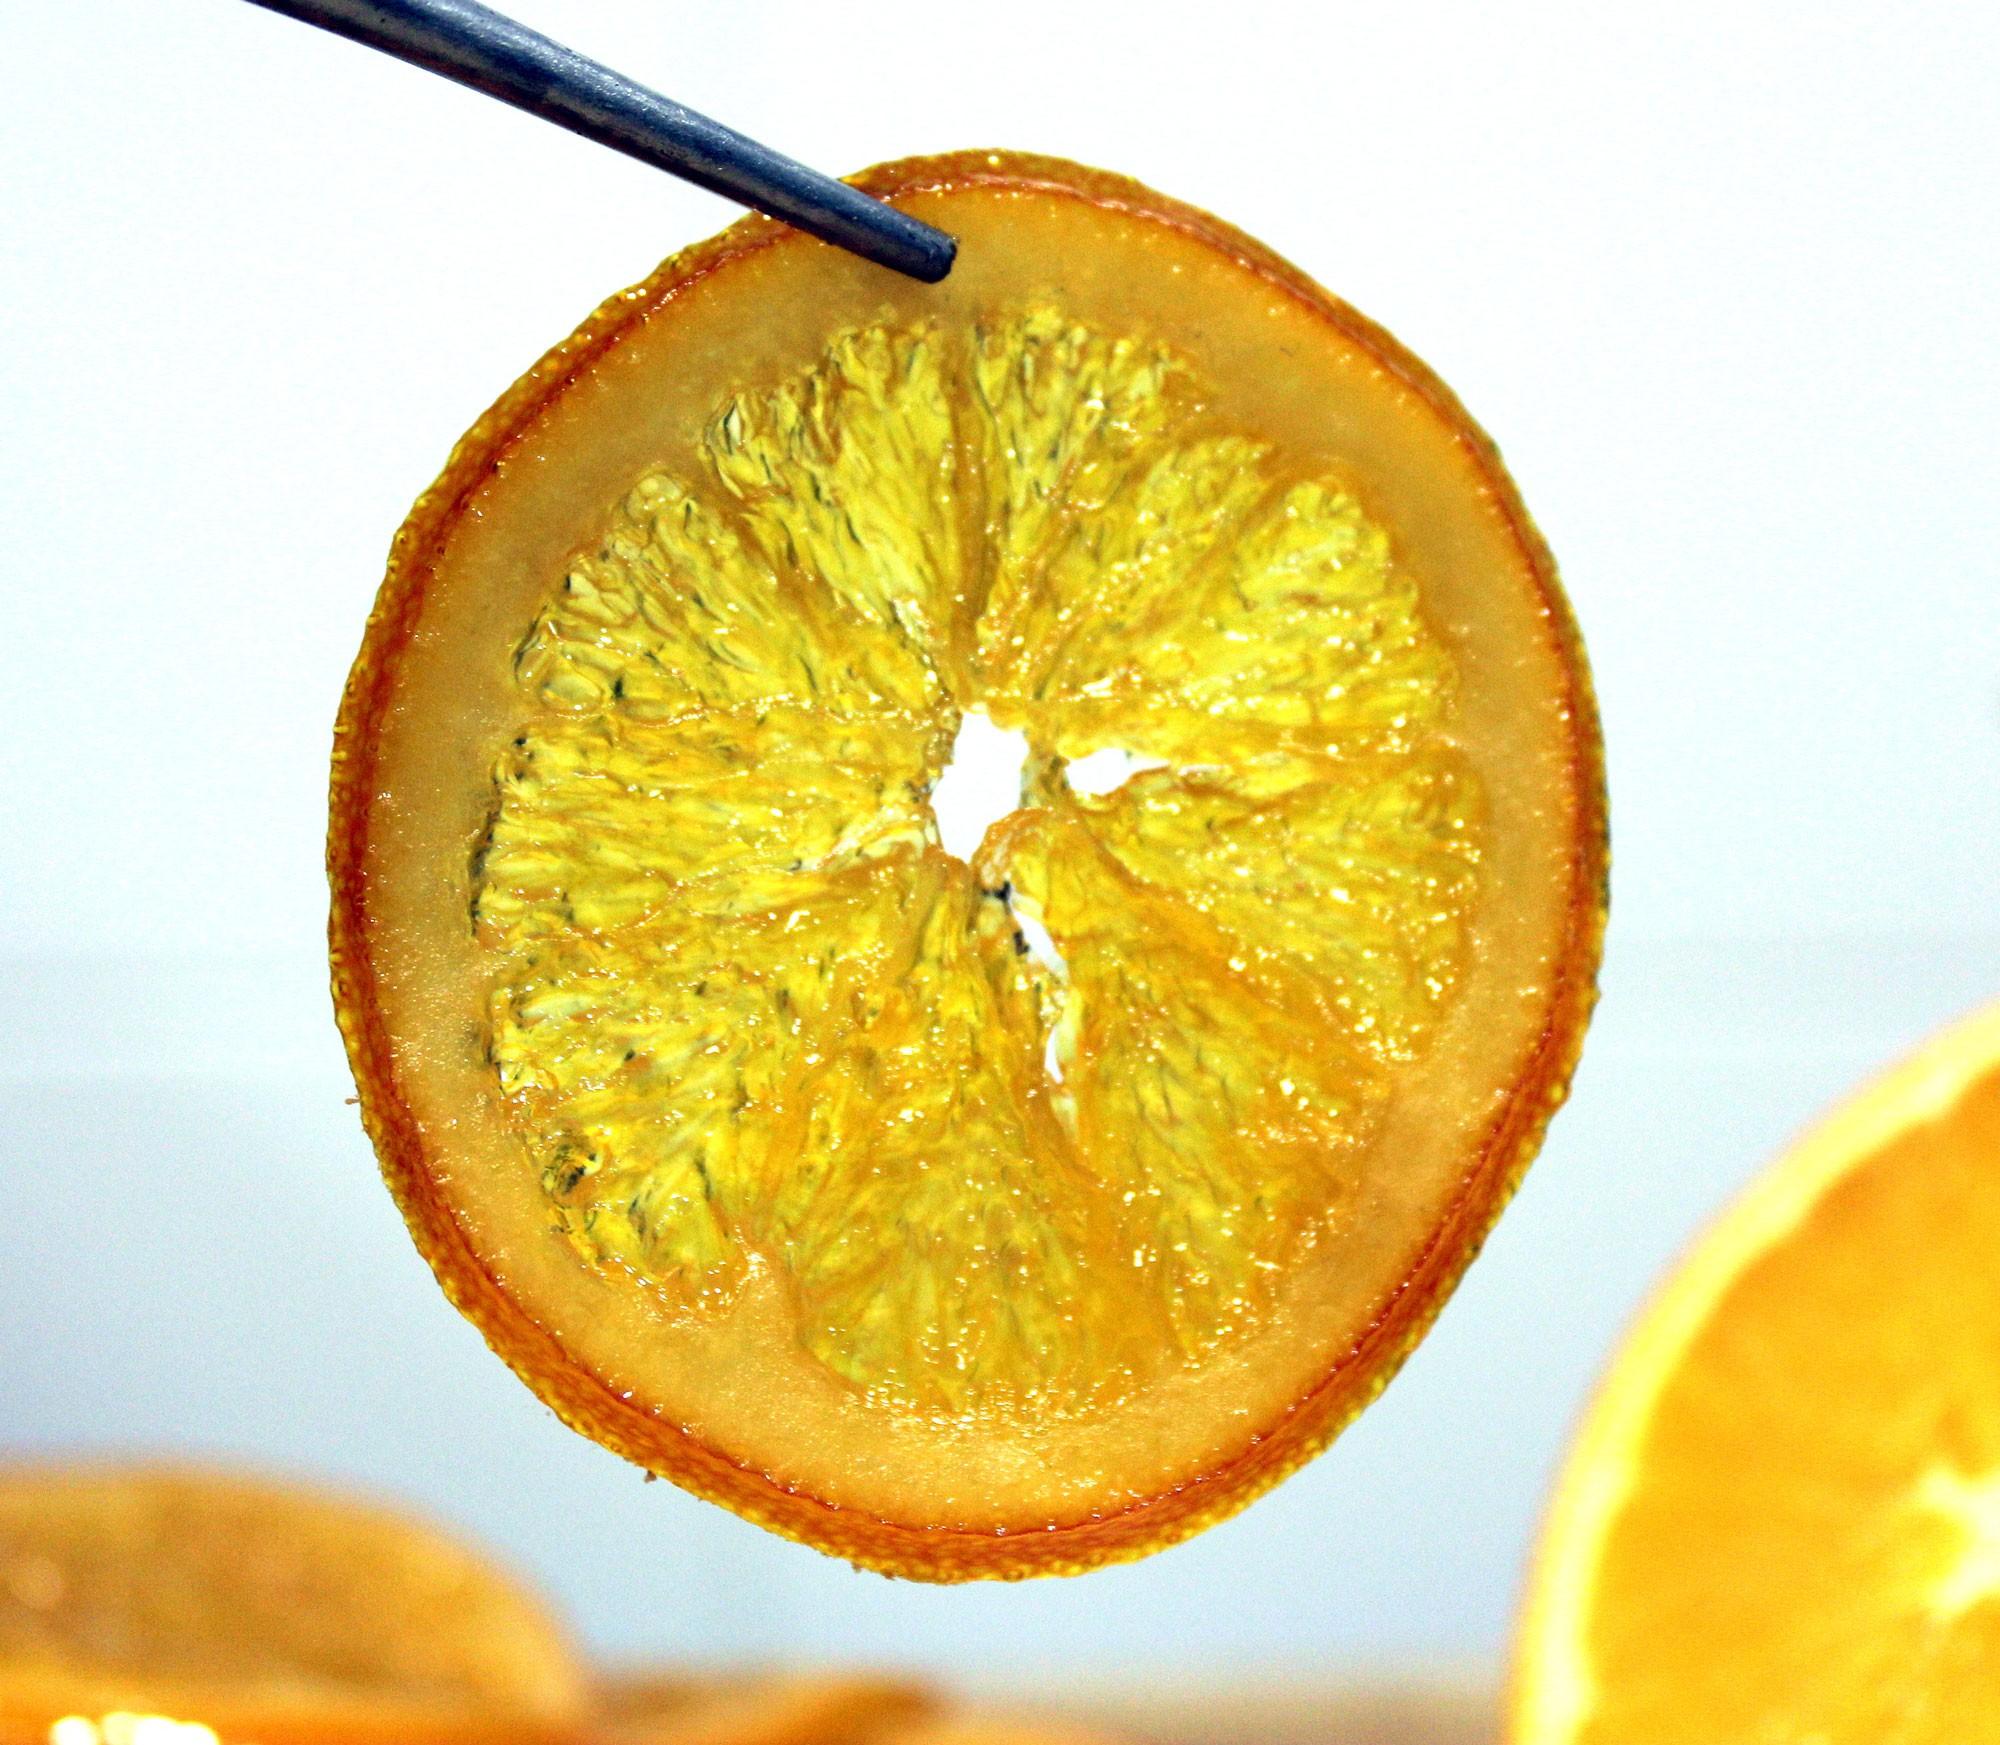 Receta de naranja confitada